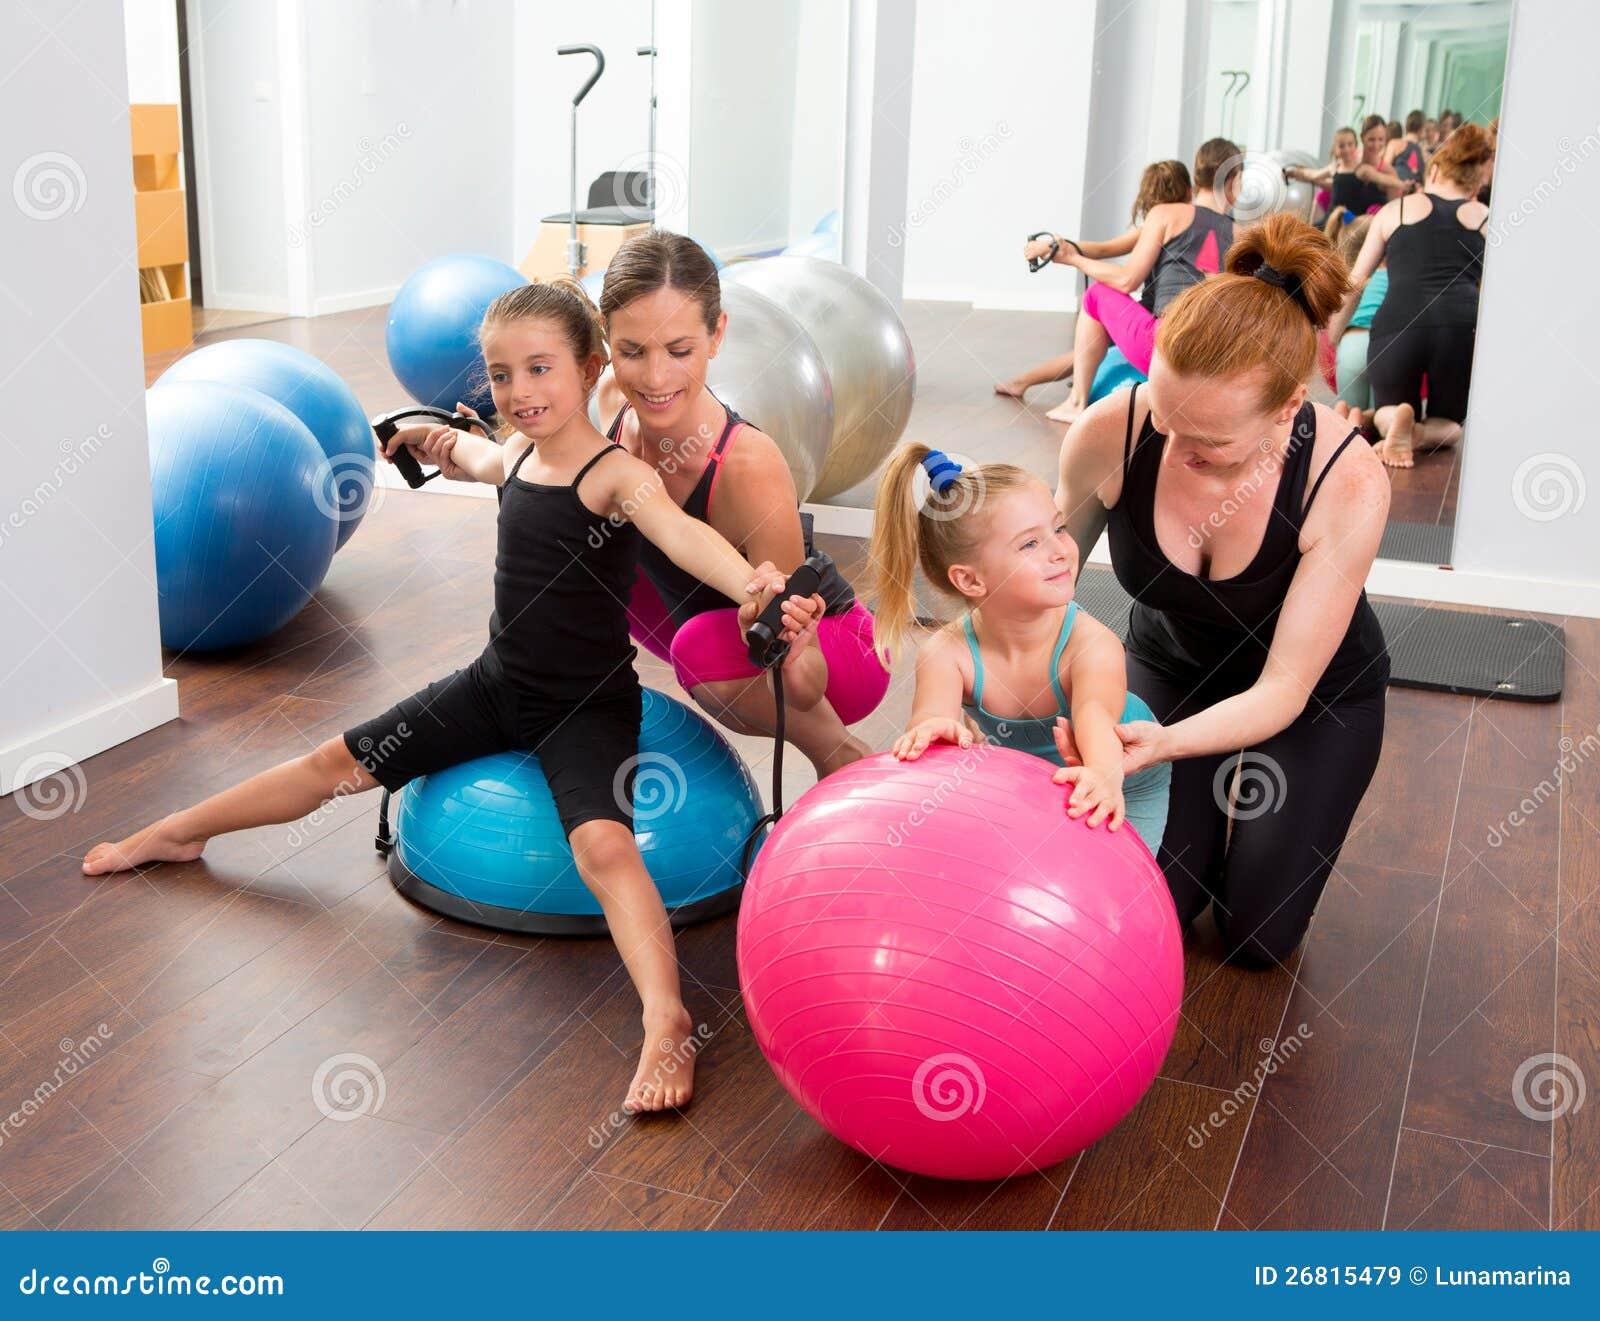 Making fitness a habit